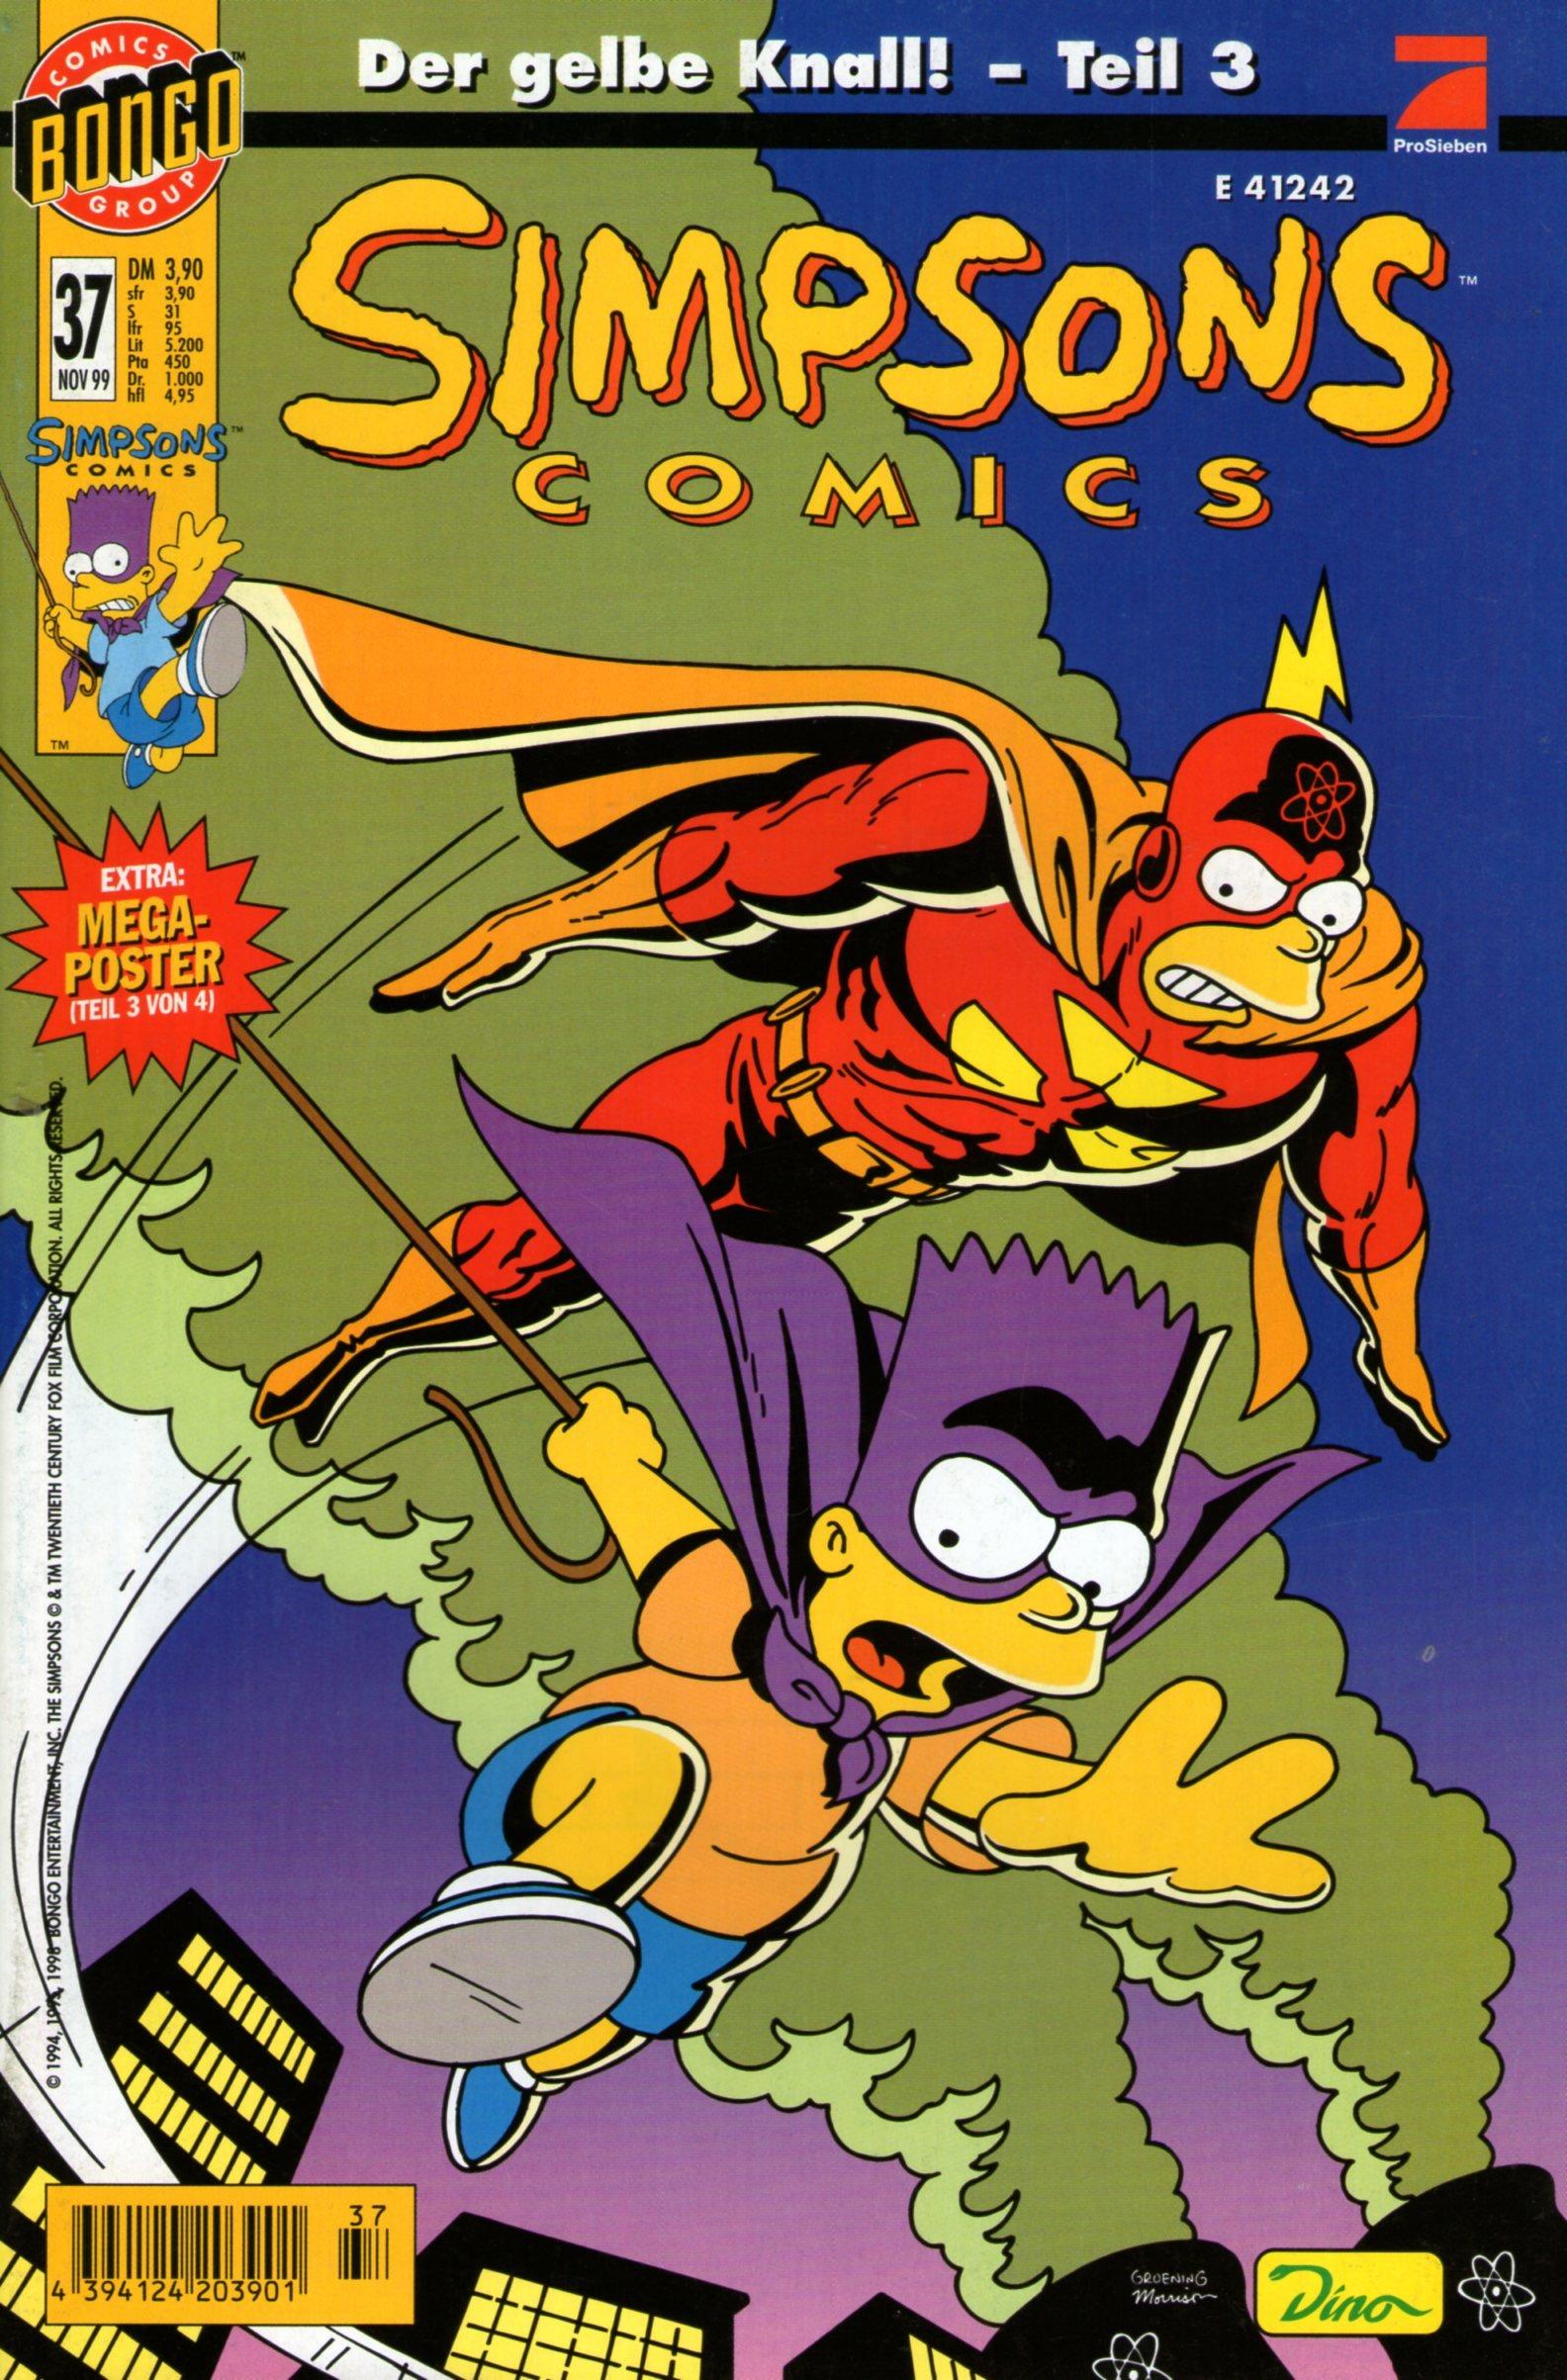 SIMPSONS Comics   37   Der Gelbe Knall   Comic Teil 3   Inkl. Mega Poster   DINO  Simpsons